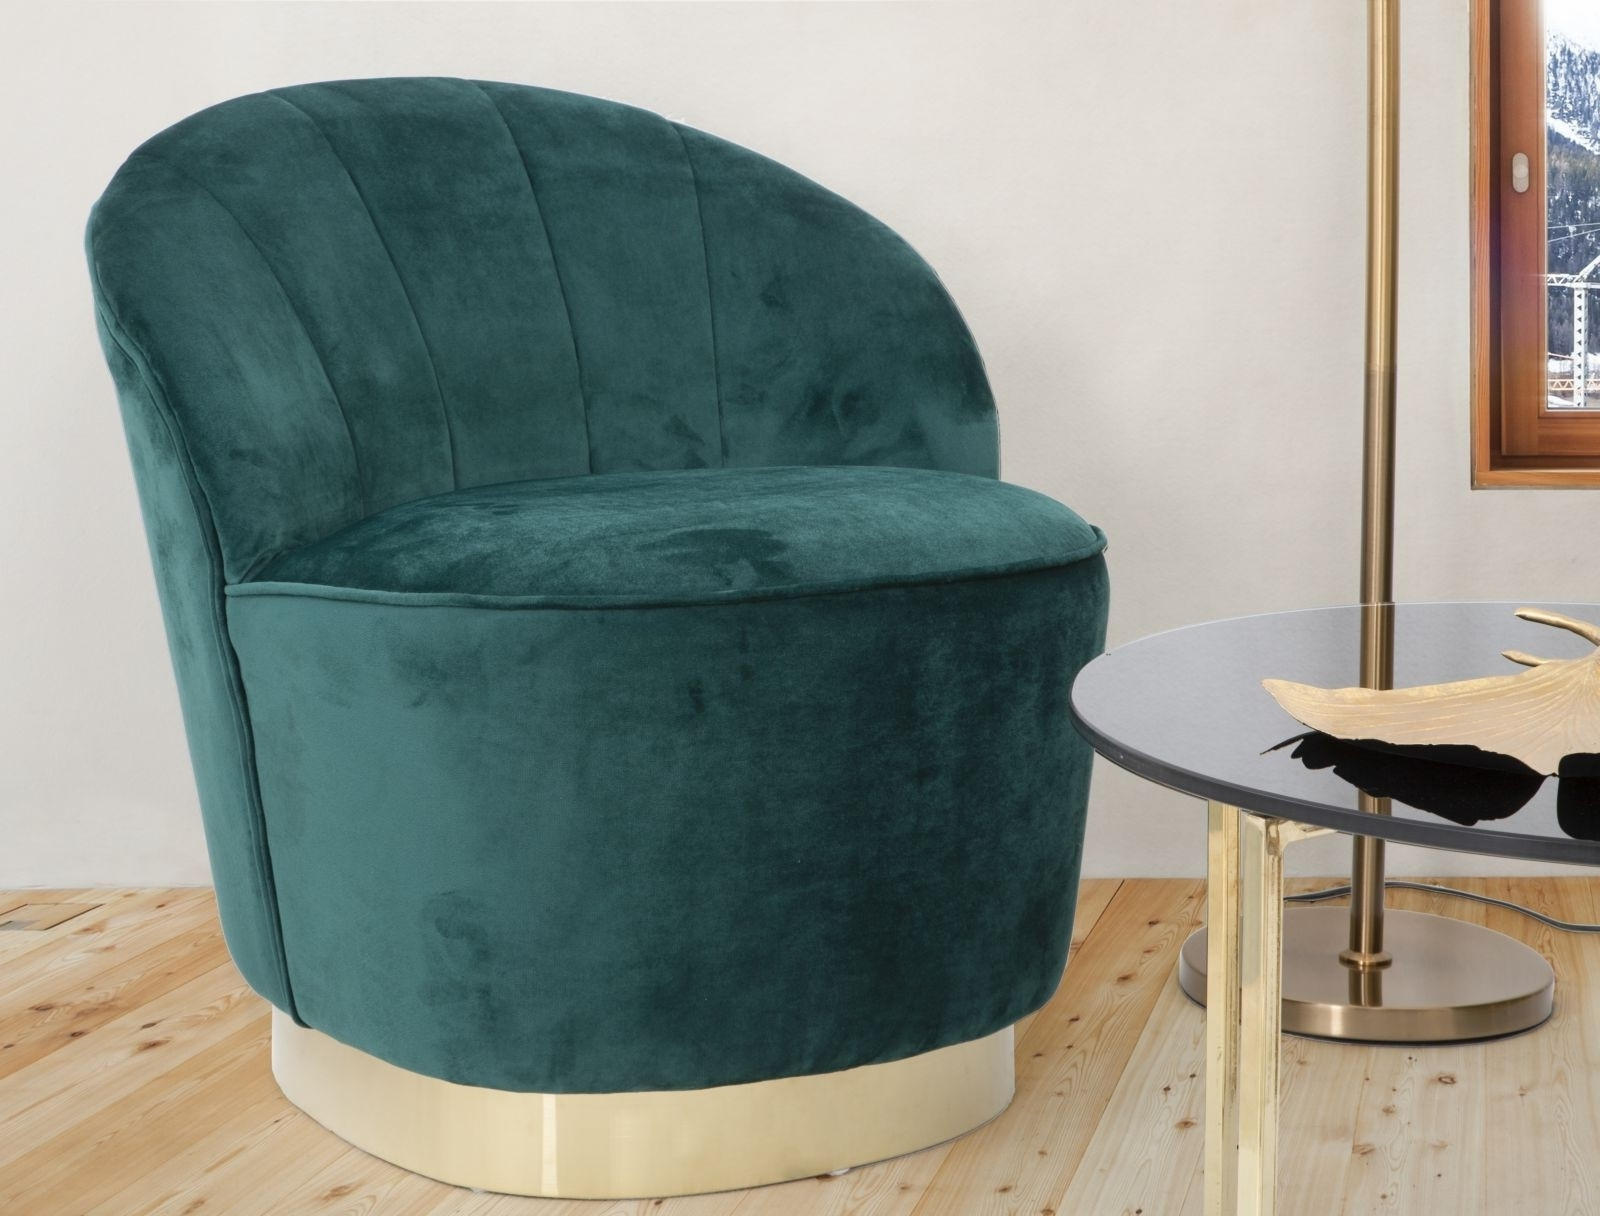 Fotoliu fix tapitat cu stofa Sopy Velvet Verde inchis / Auriu, l67xA71xH70 cm somproduct.ro